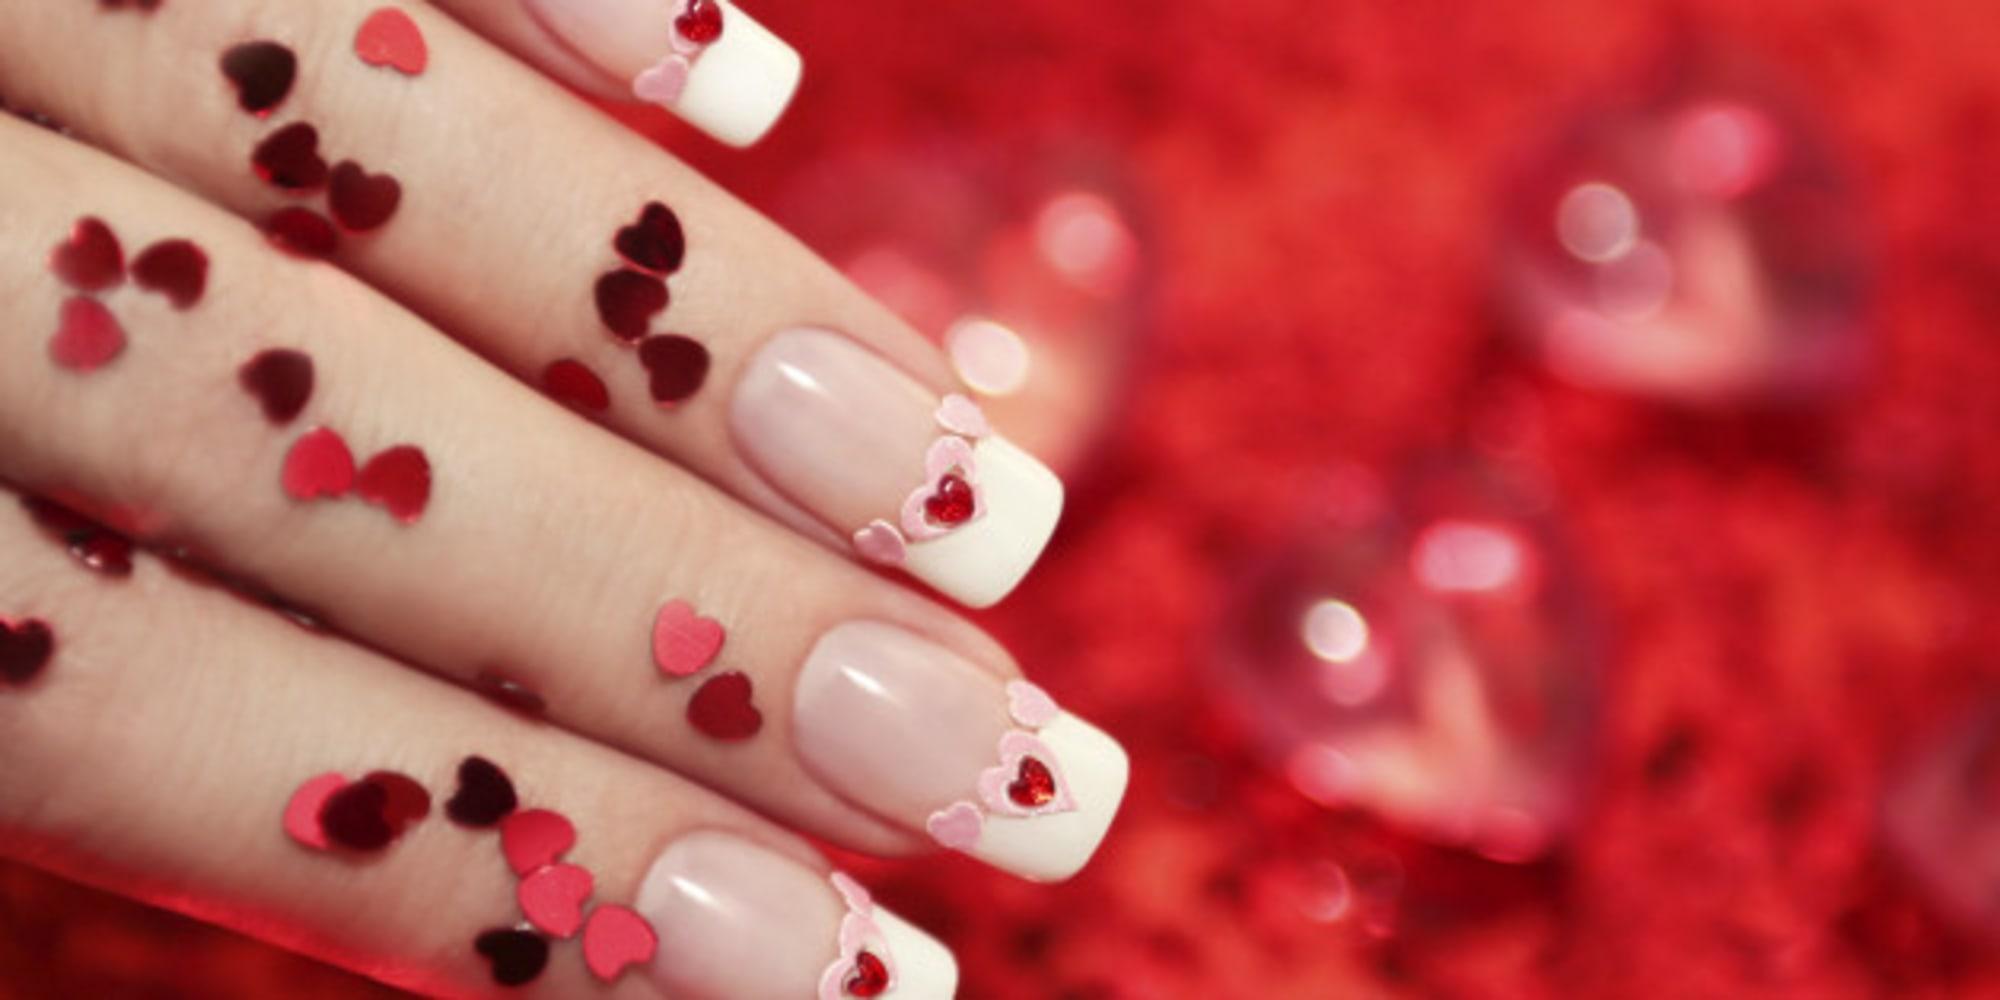 Nail Art Salon In Andheri West Nails Polish Colour